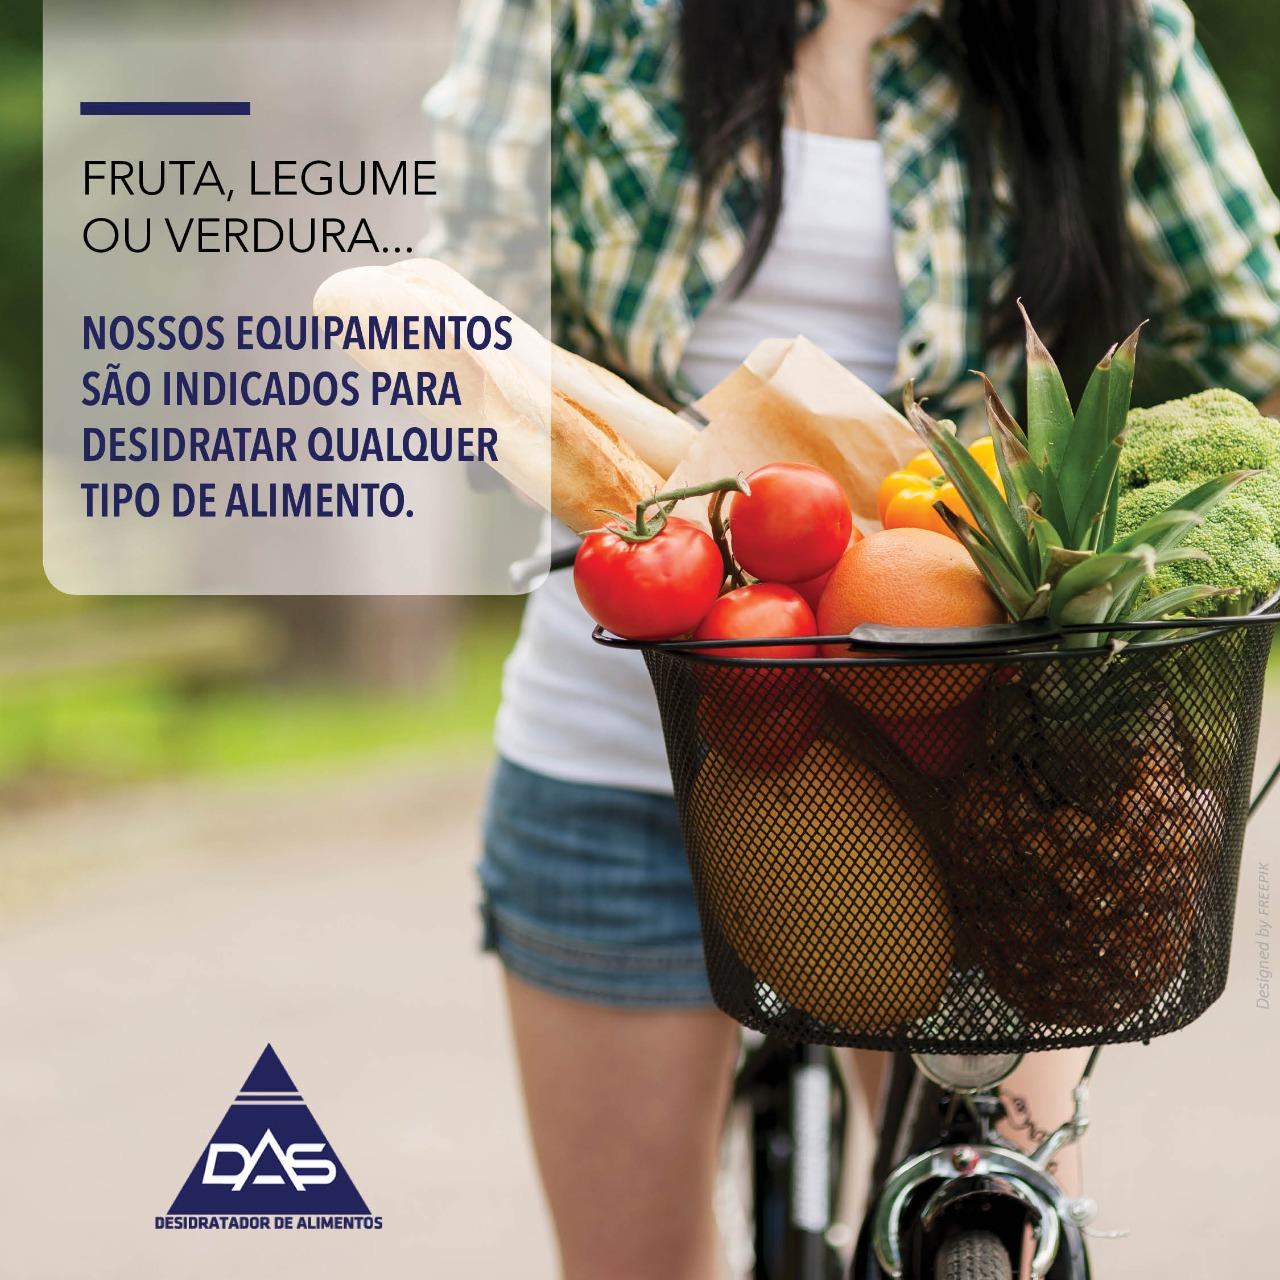 Desidratador de frutas e legumes